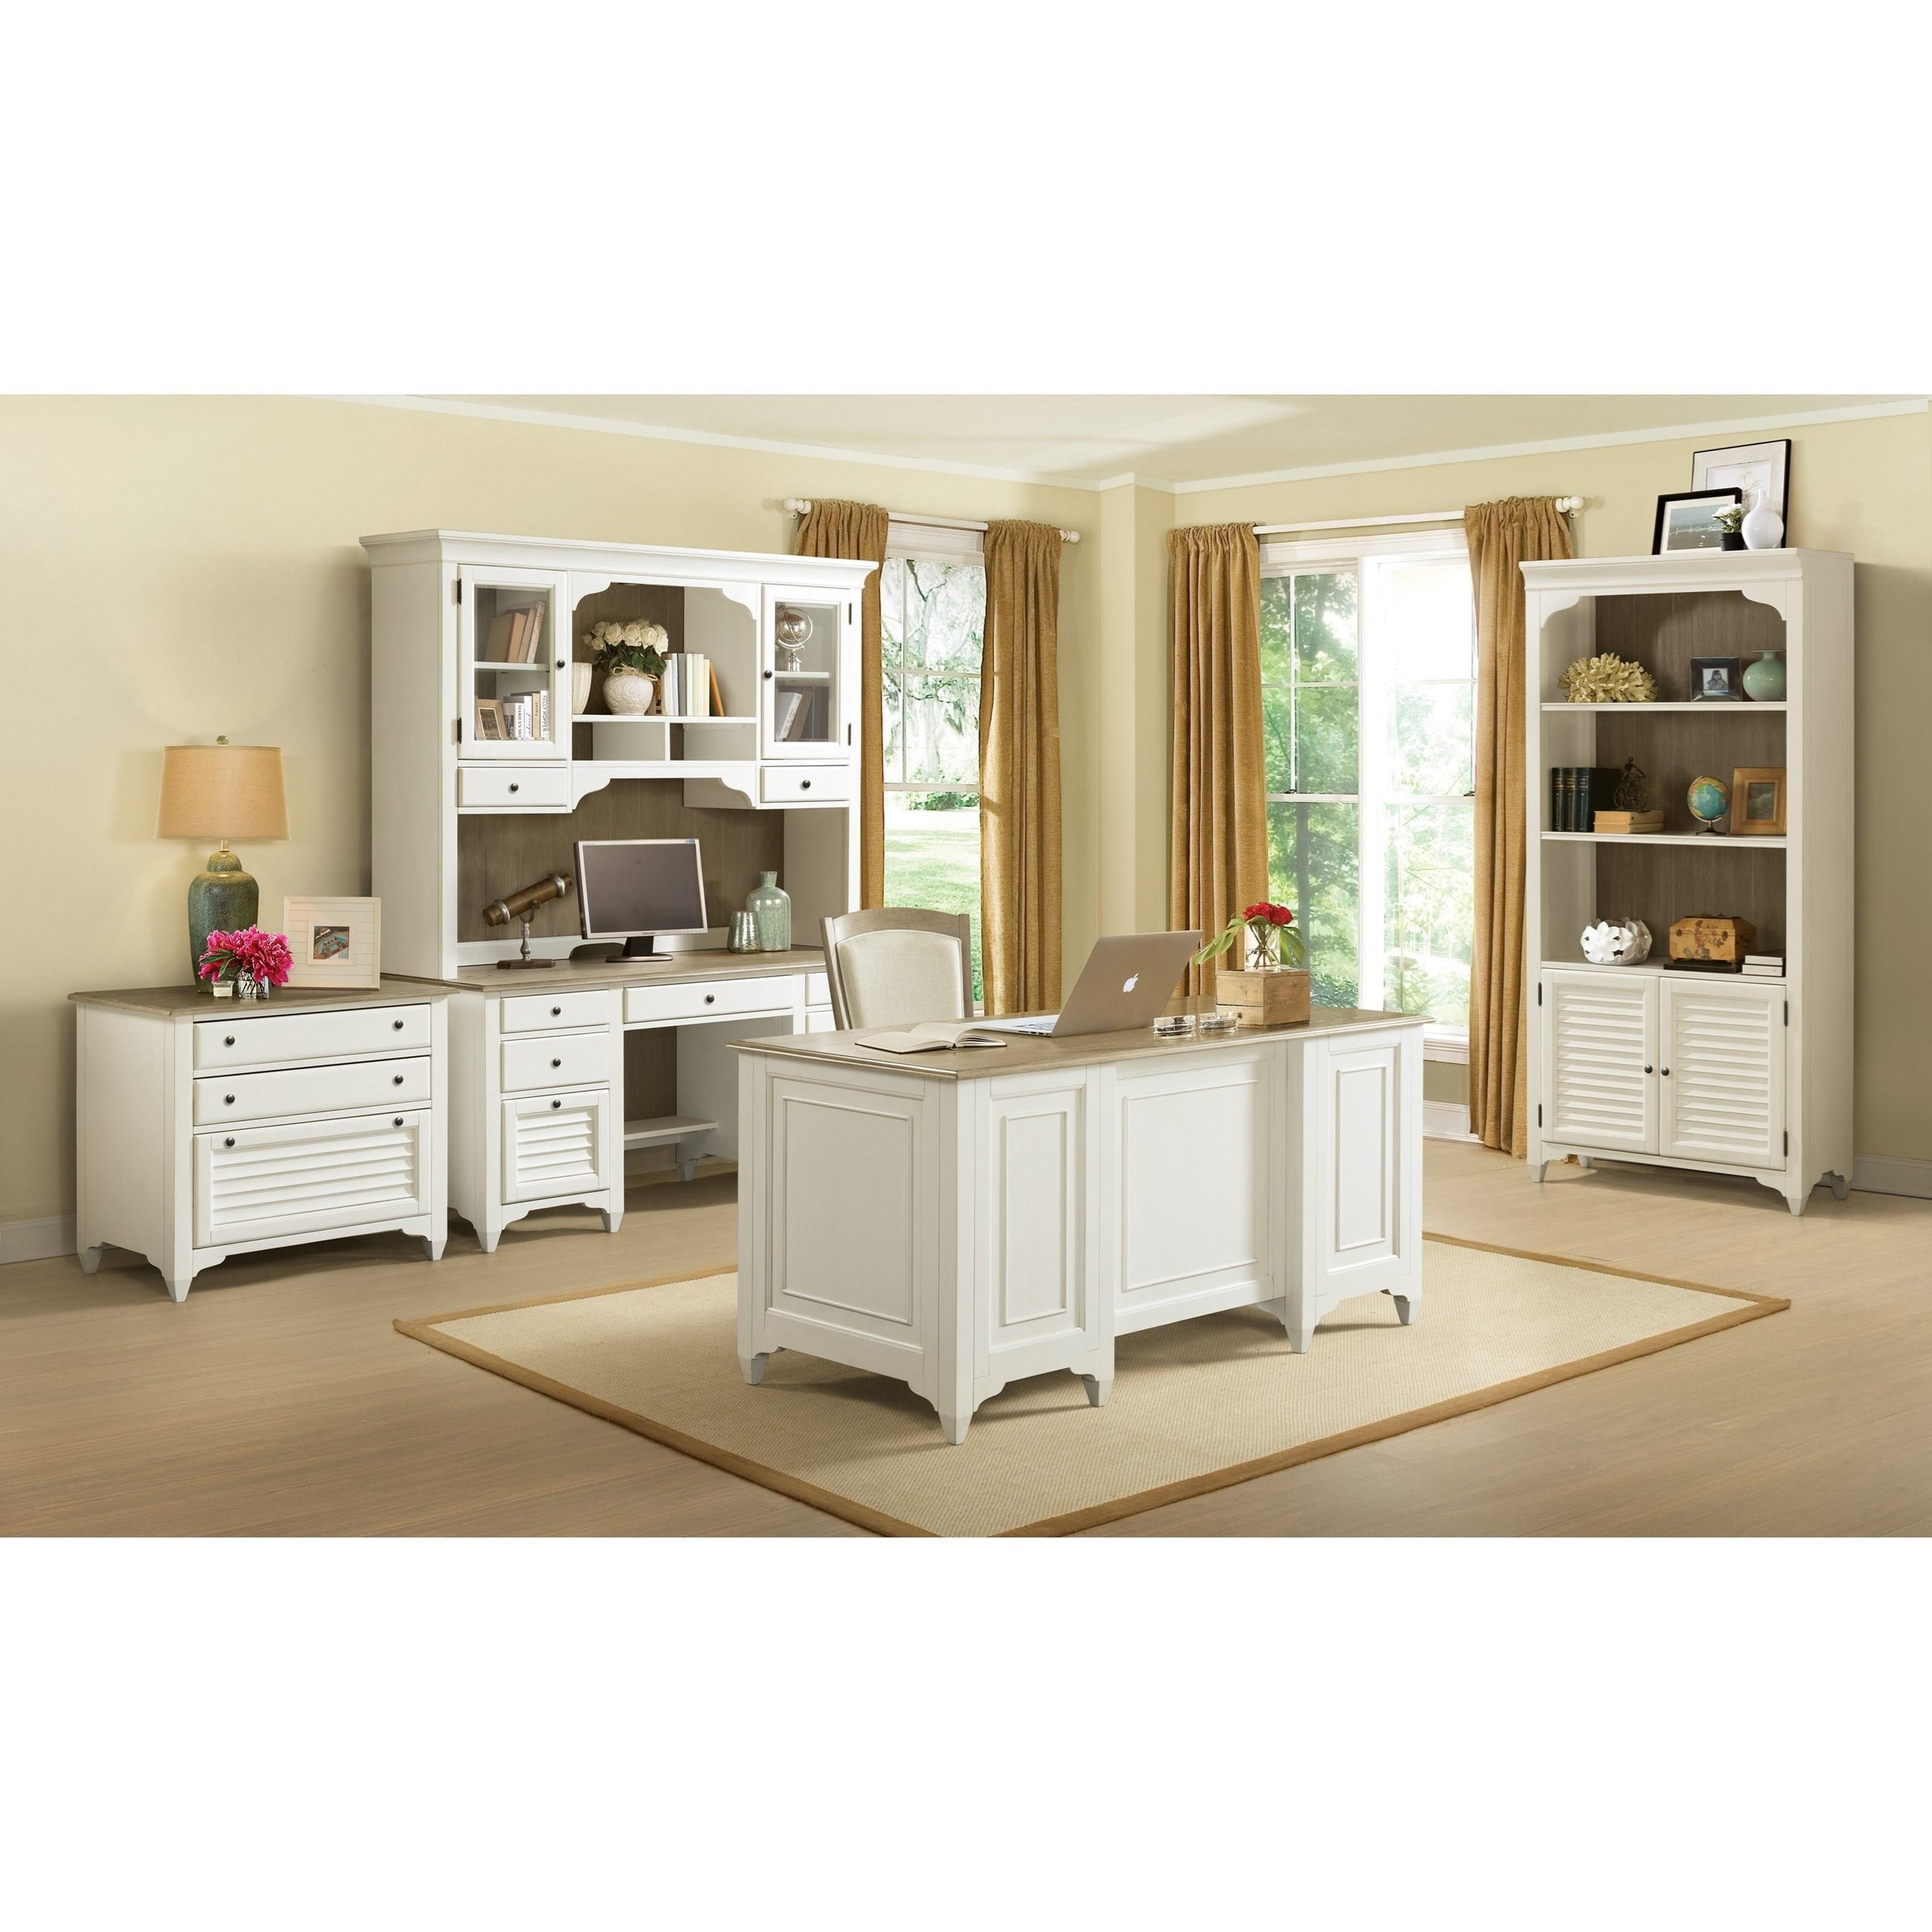 Riverside Home Office Executive Desk 44732: Riverside Furniture Myra Executive Desk With File Drawers